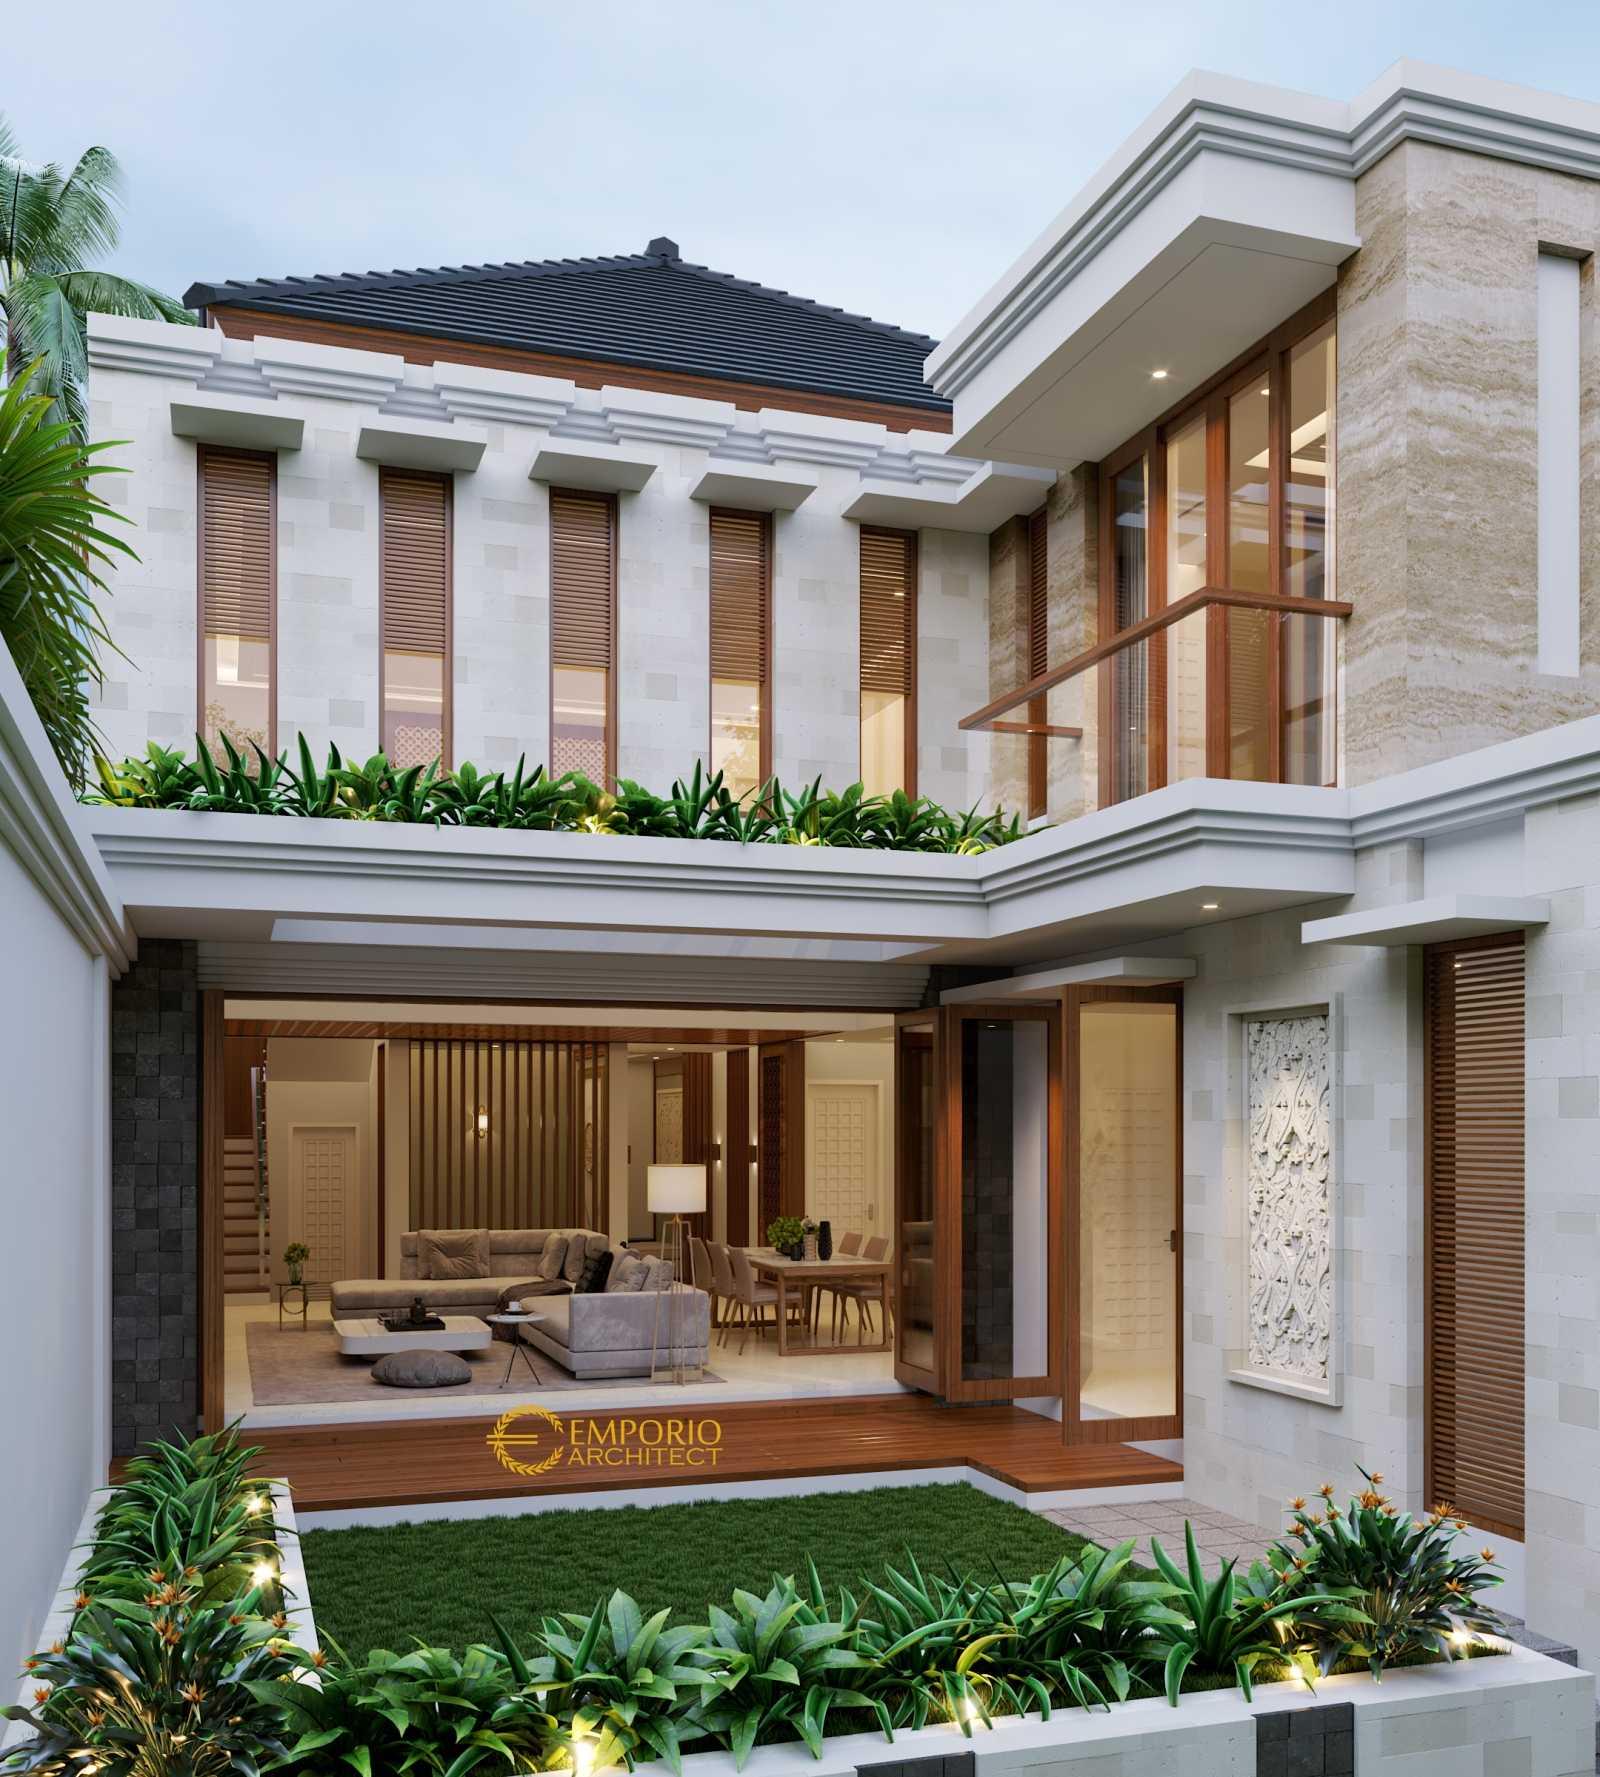 Photo Emporio-architect-desain-rumah-villa-bali-tropis-609